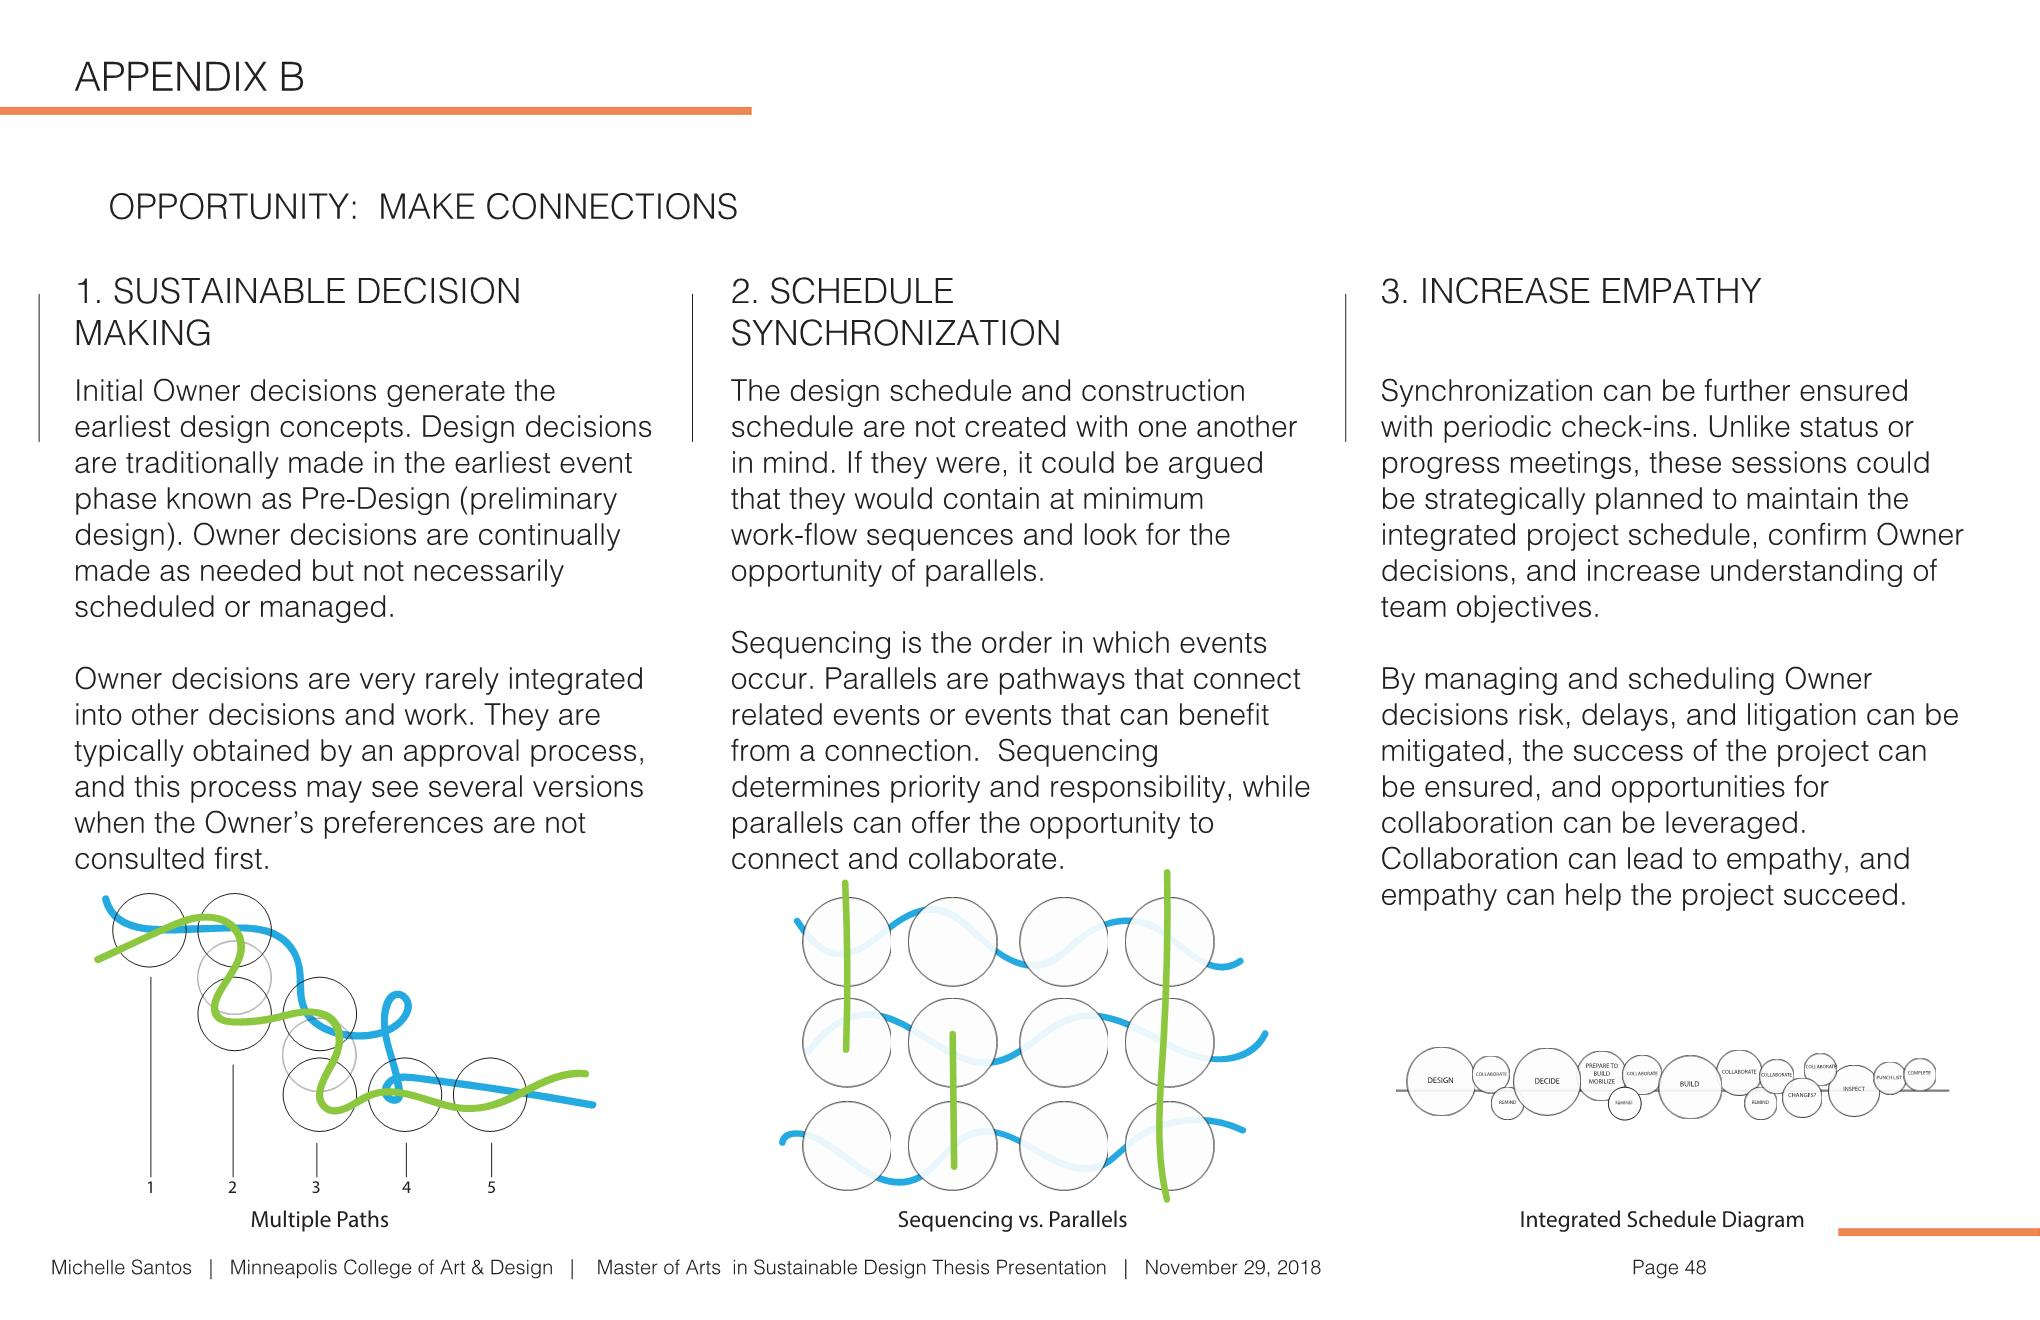 MSantos_Thesis Presentation_2018.12.11_small2 Page 053.jpg